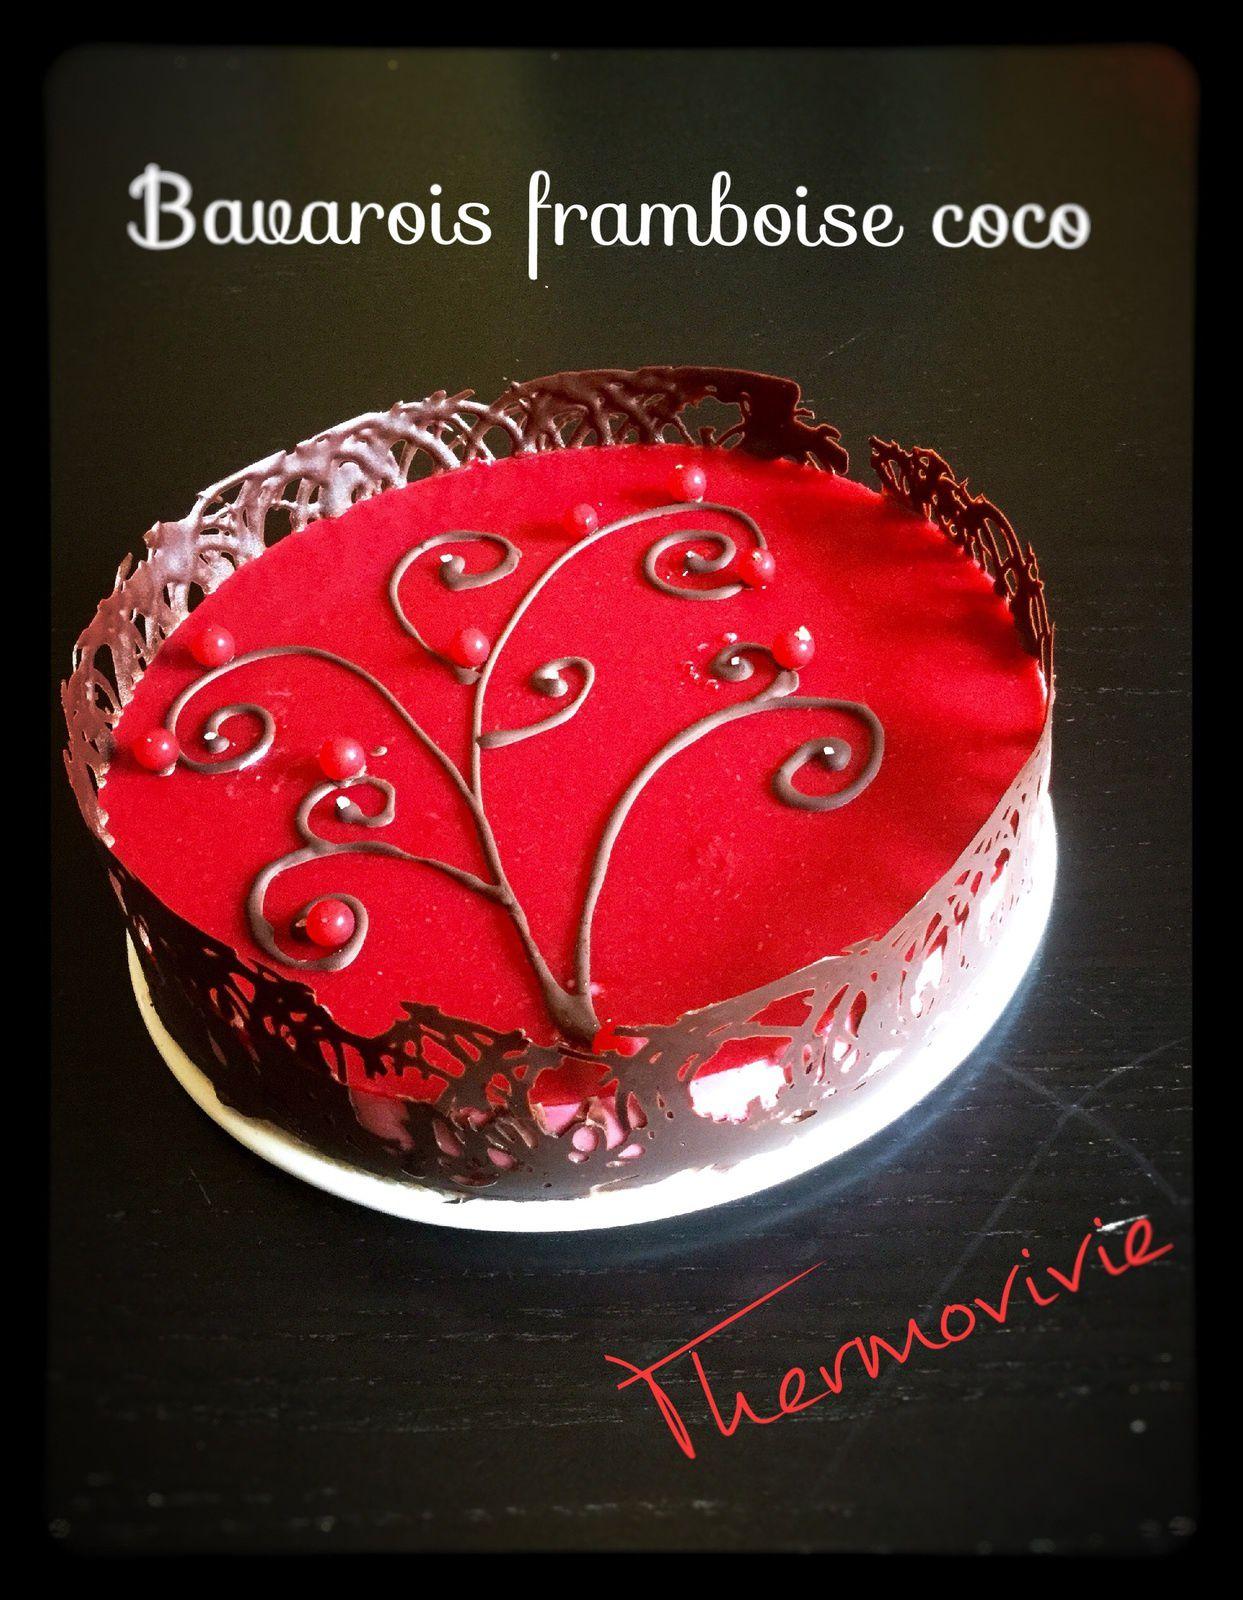 Berühmt Bavarois framboise coco, recette au thermomix - Thermovivie TJ14